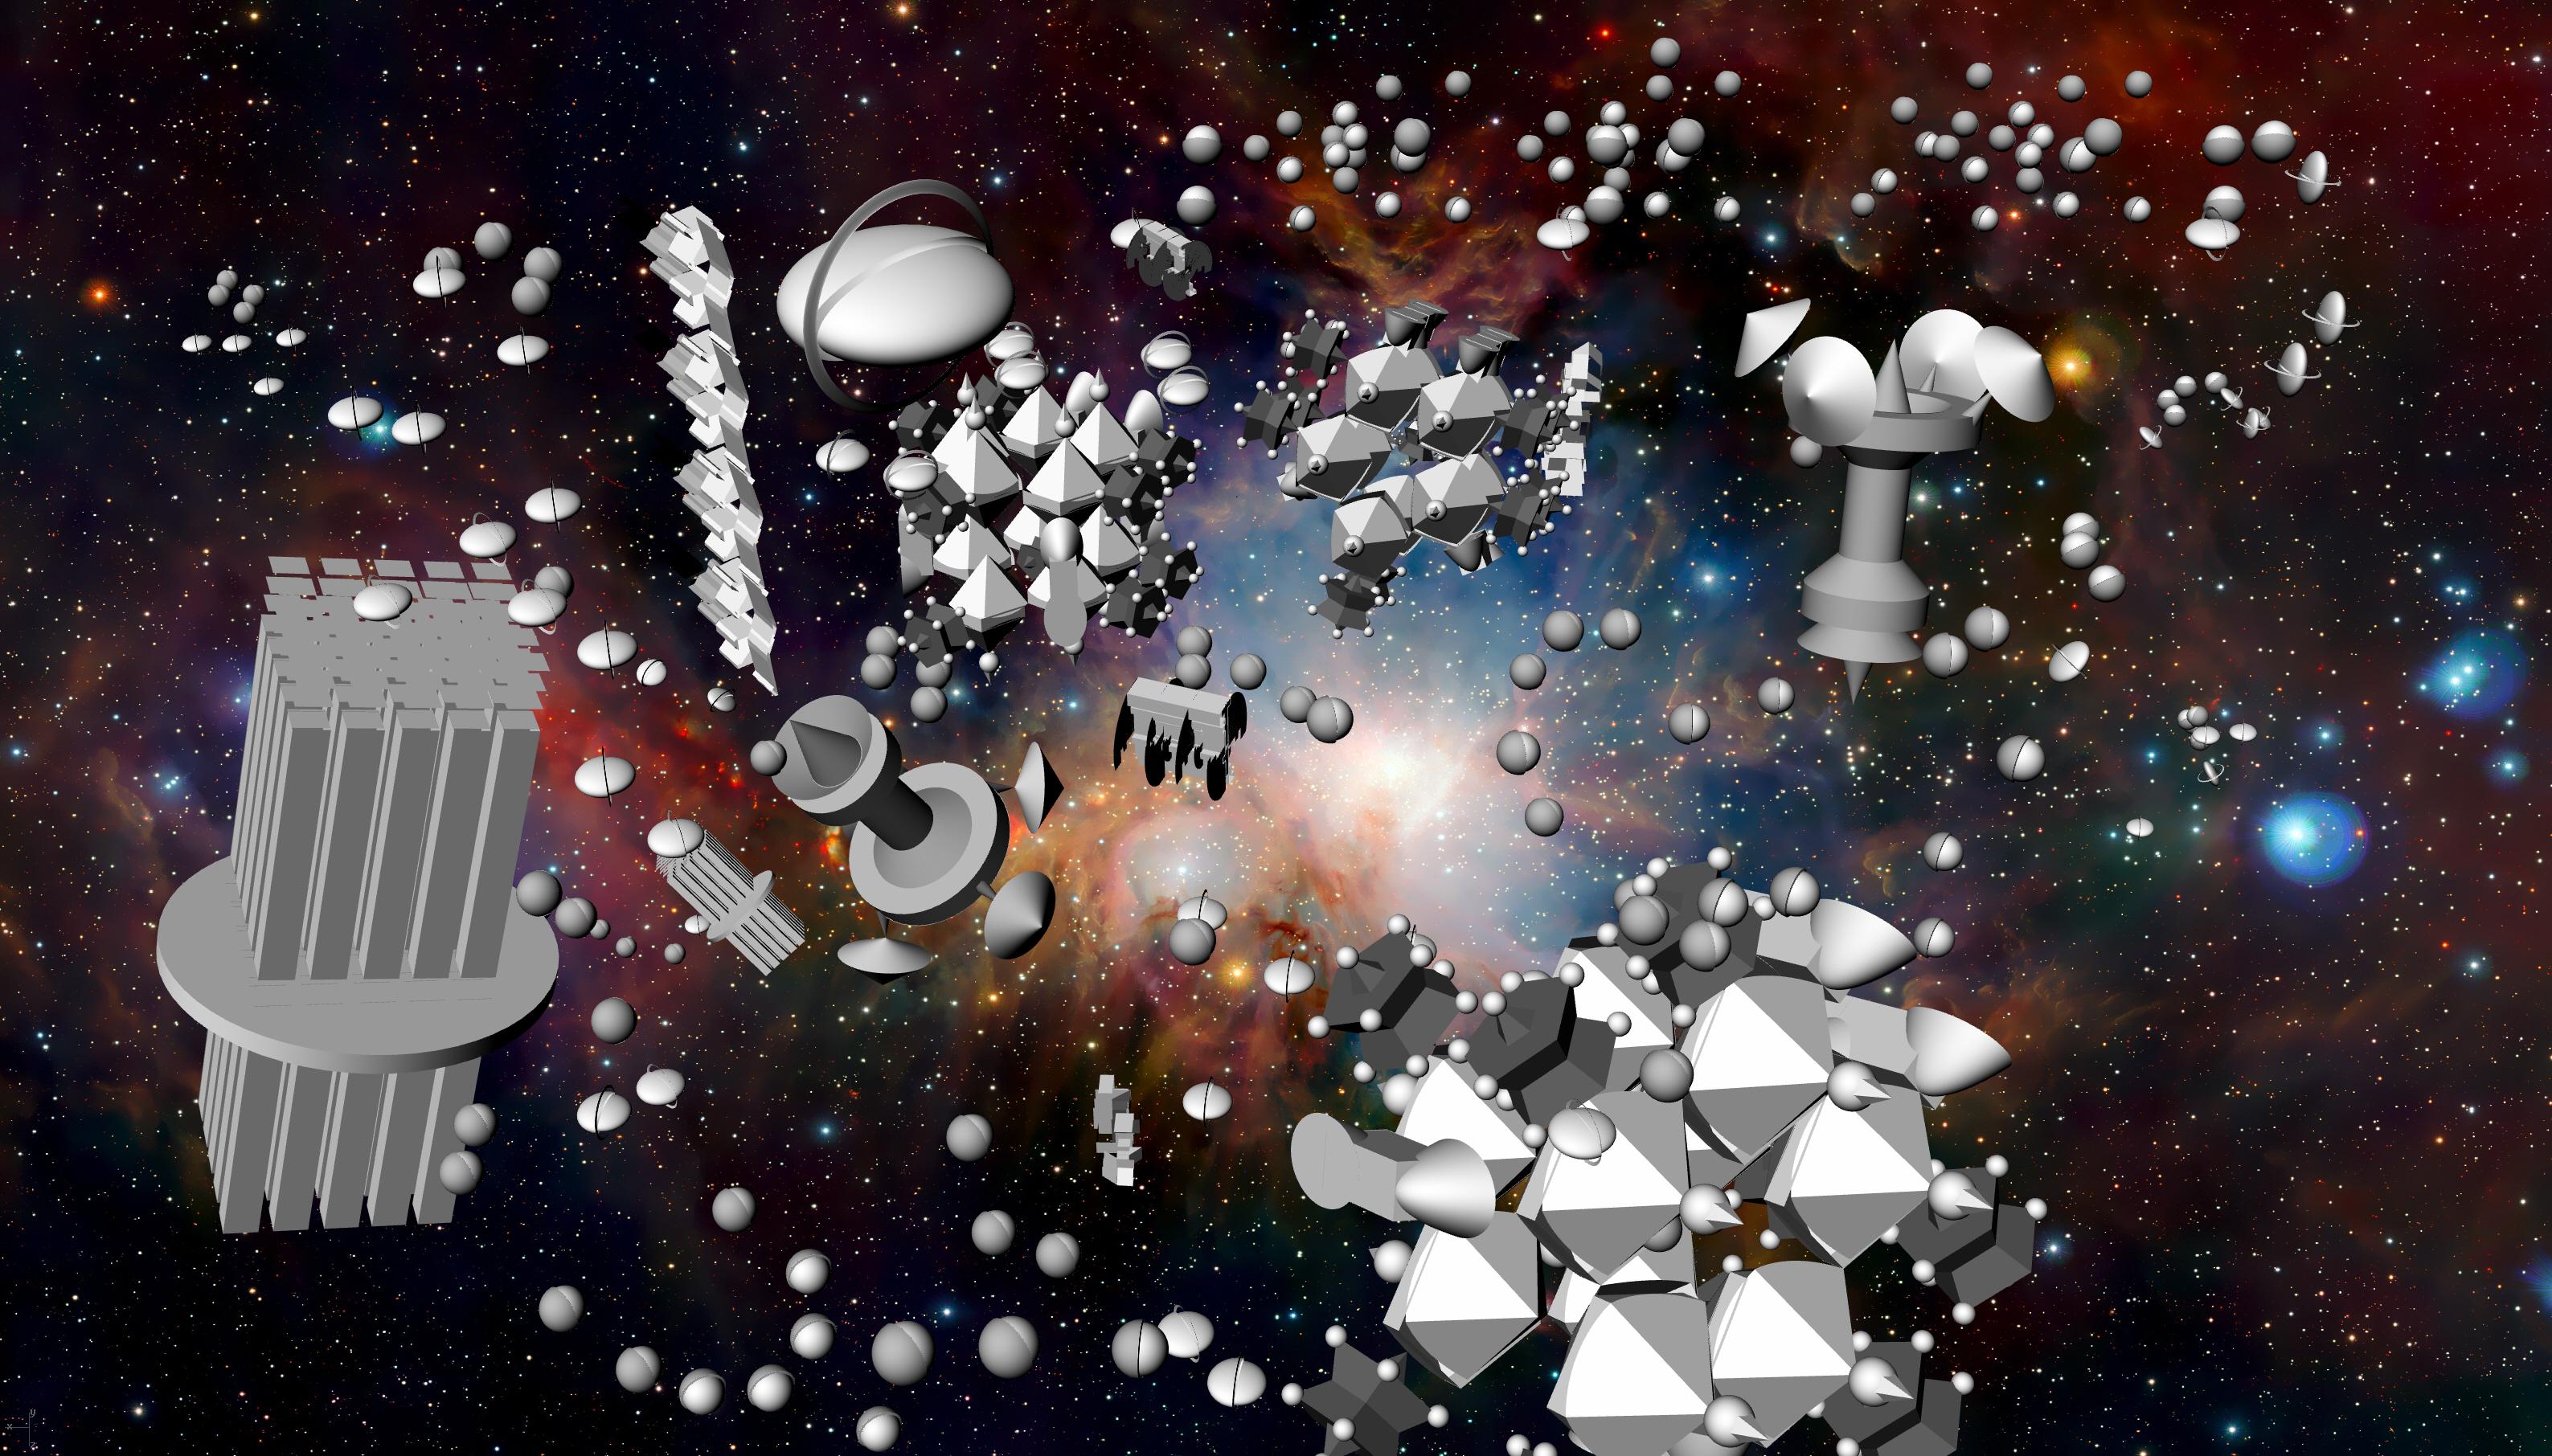 ahmad-yassir-artist-digital-art-ships-1